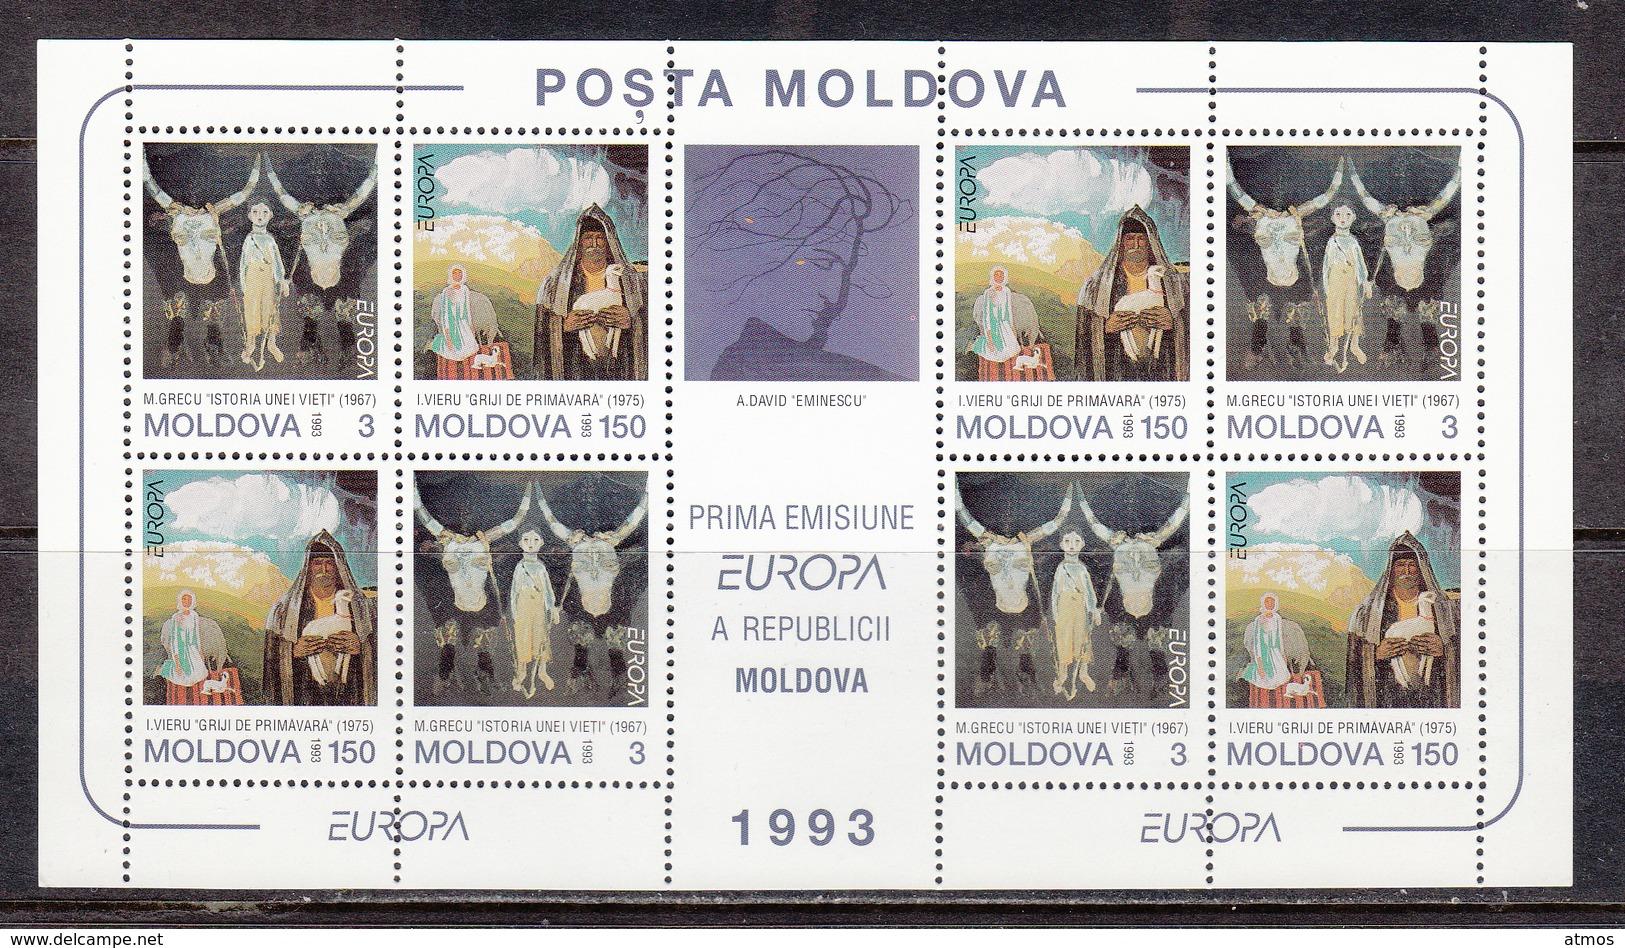 Moldavia MNH Michel Nr 94/95 Sheet From 1993 CEPT / Catw 16.00 EUR - Moldawien (Moldau)